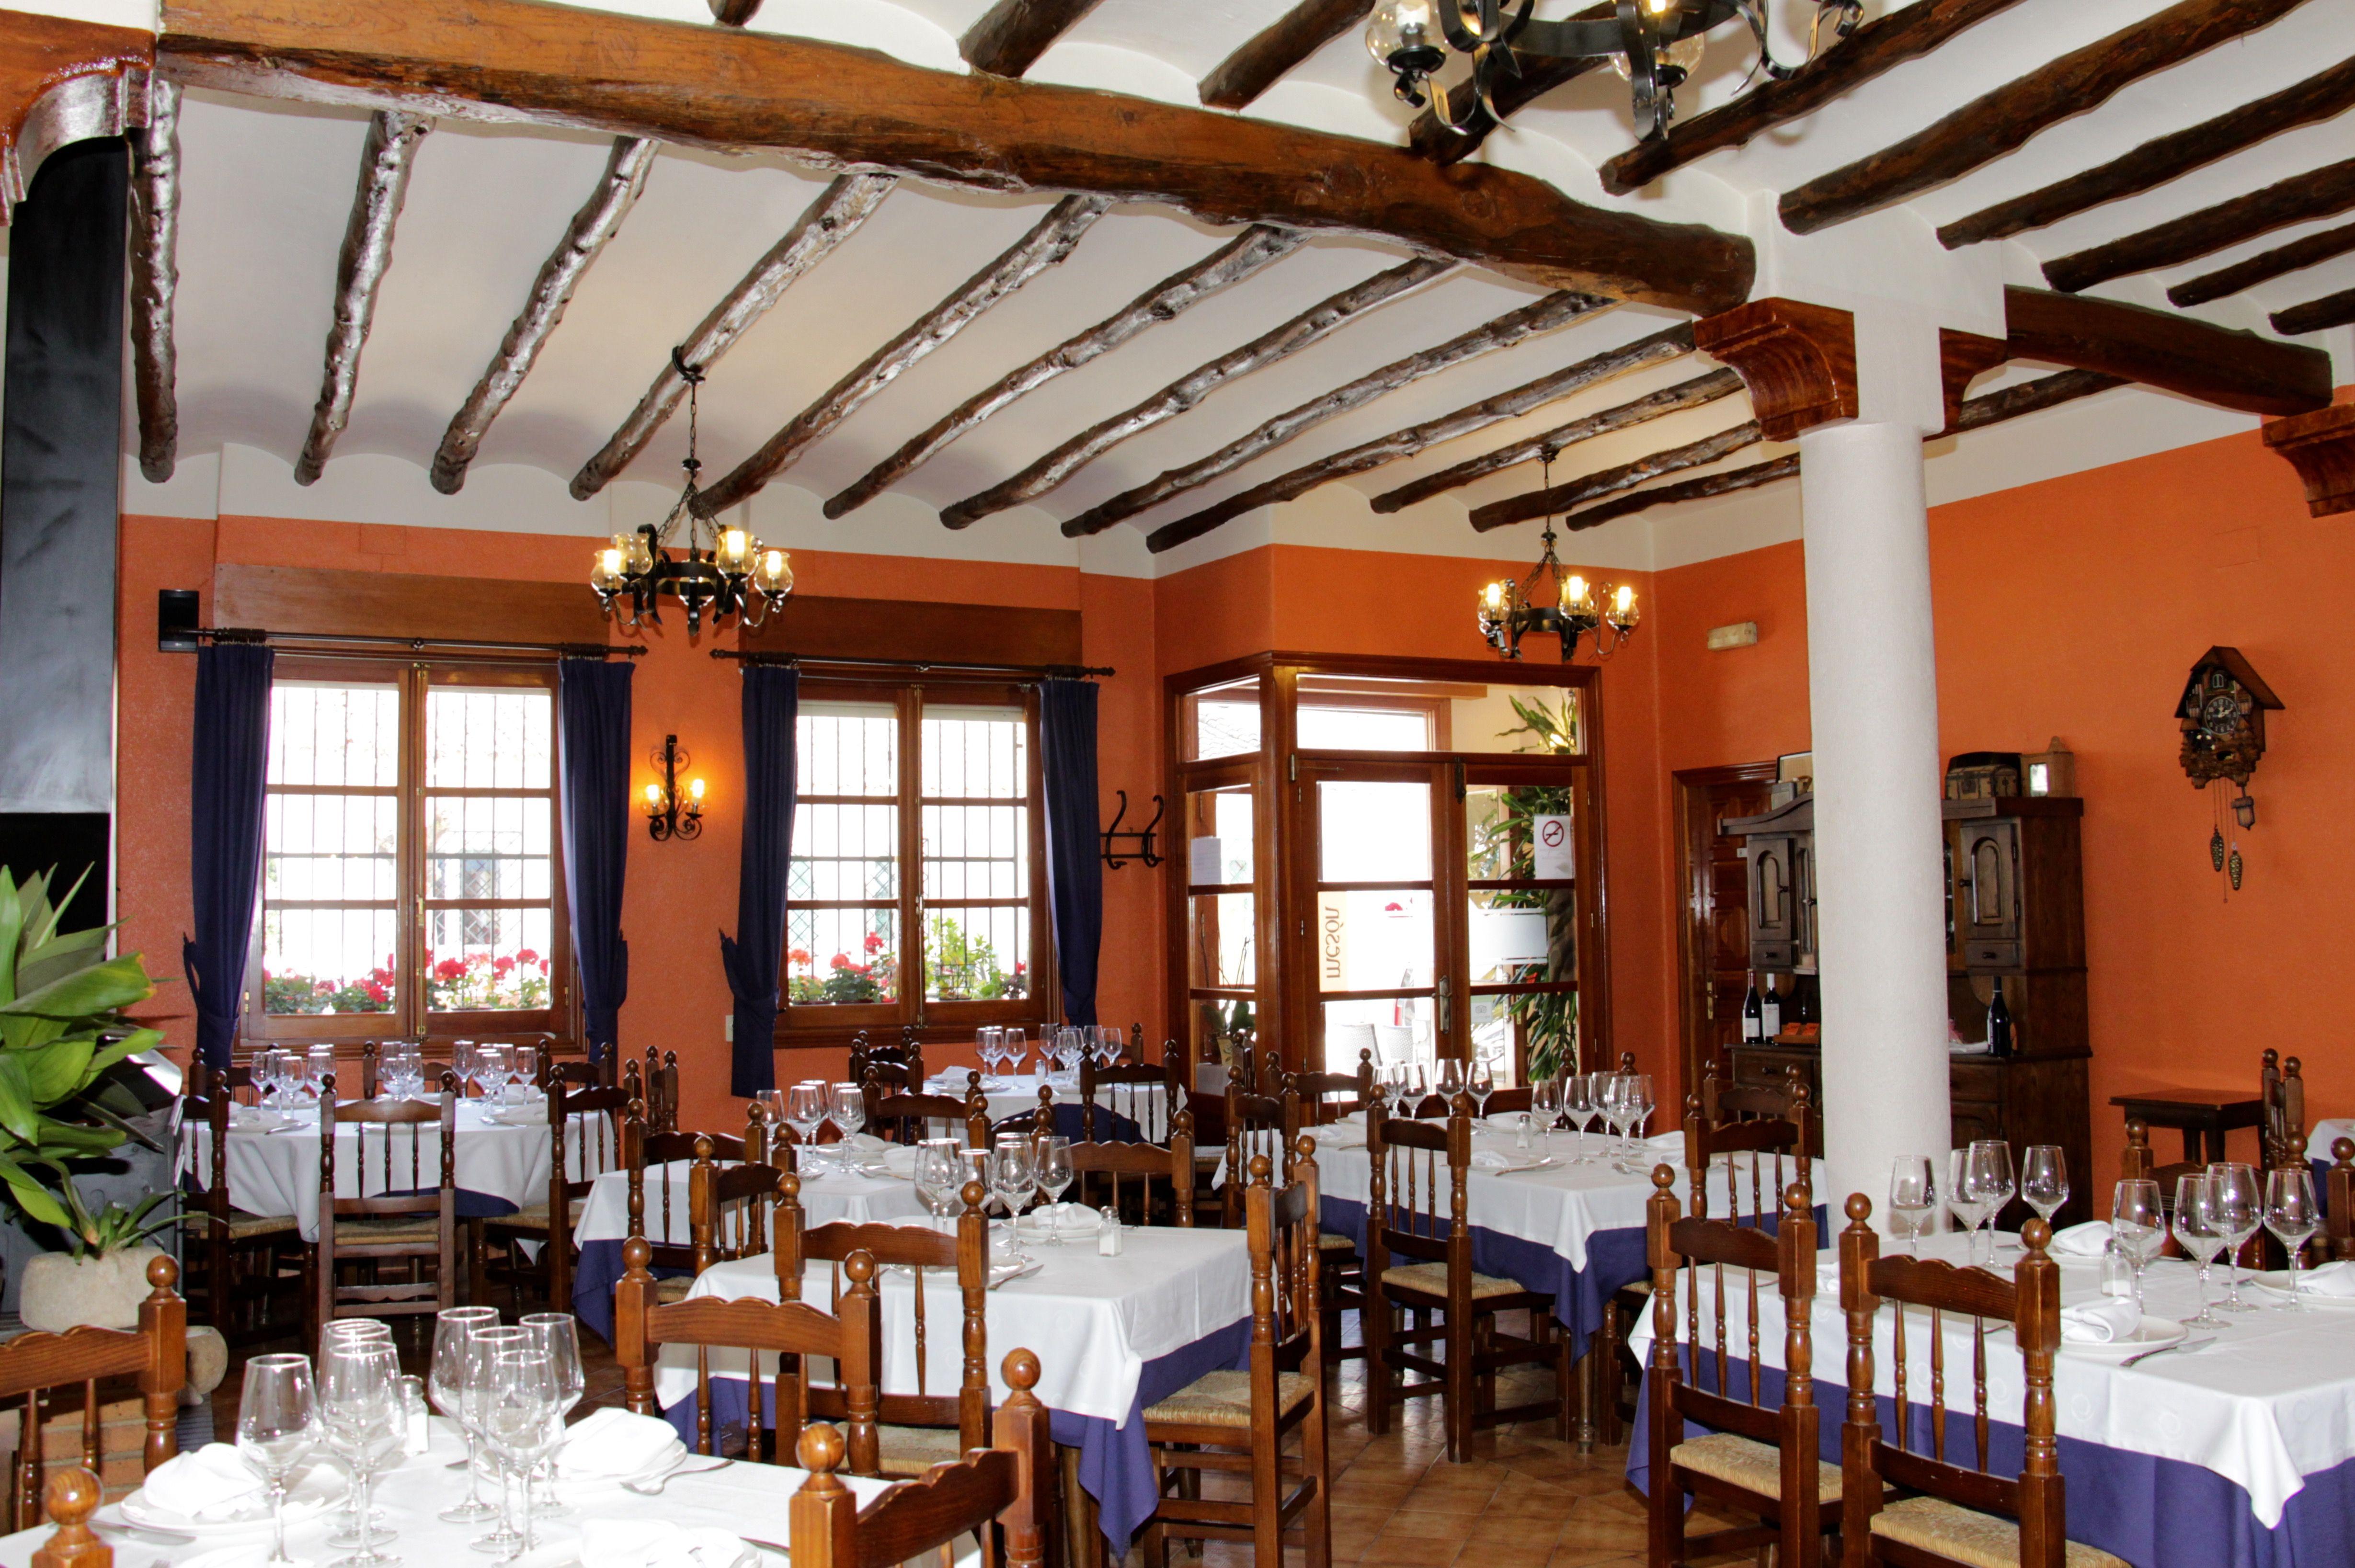 Foto 4 de Mesón - restaurante en Benimantell | Mesón Ca Rafel